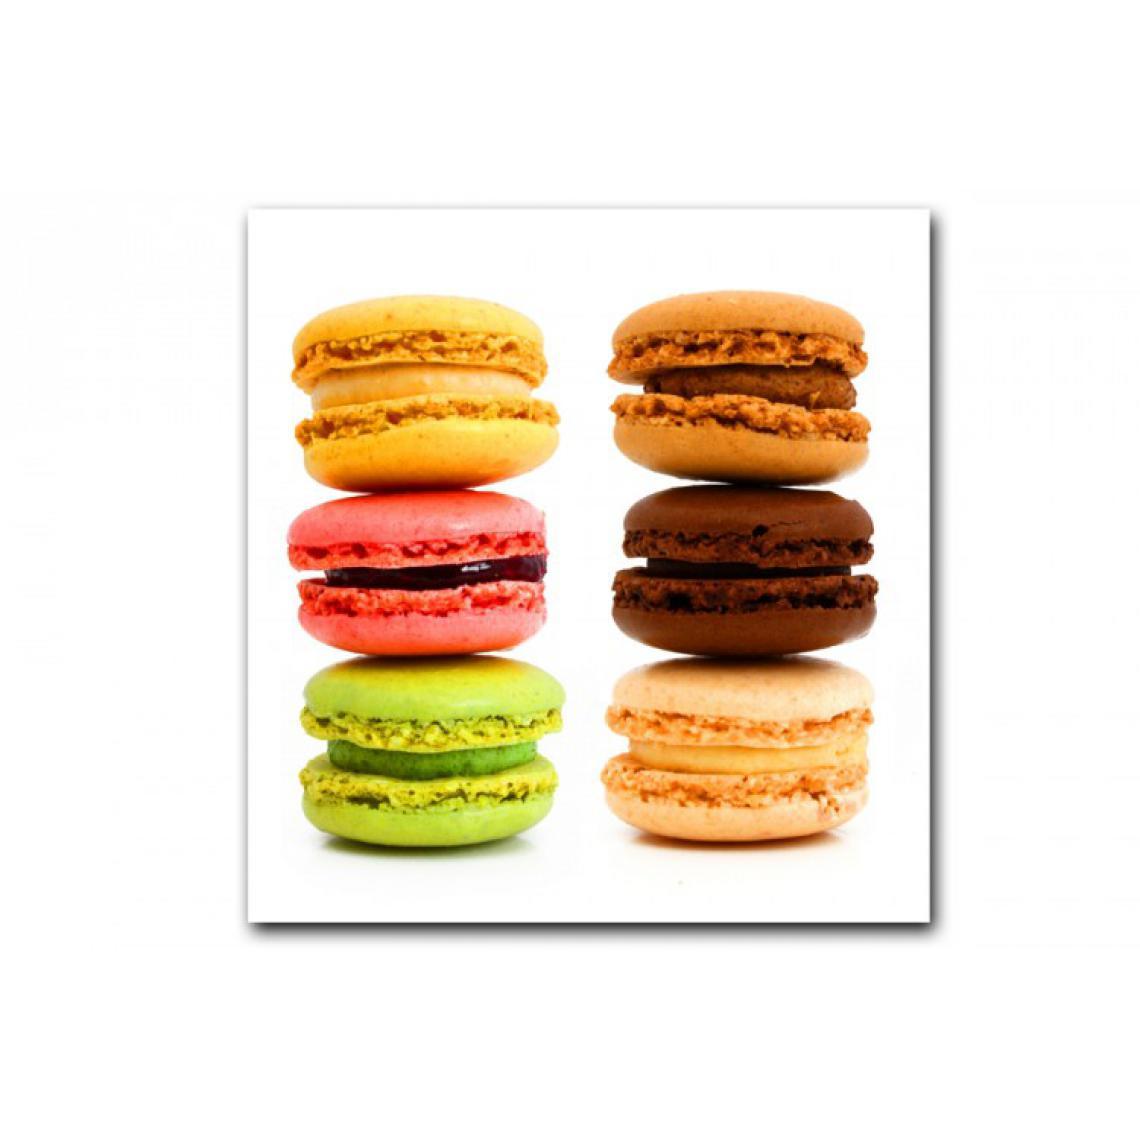 Tableau Gourmand Multicolore Macaron 50X50 cm